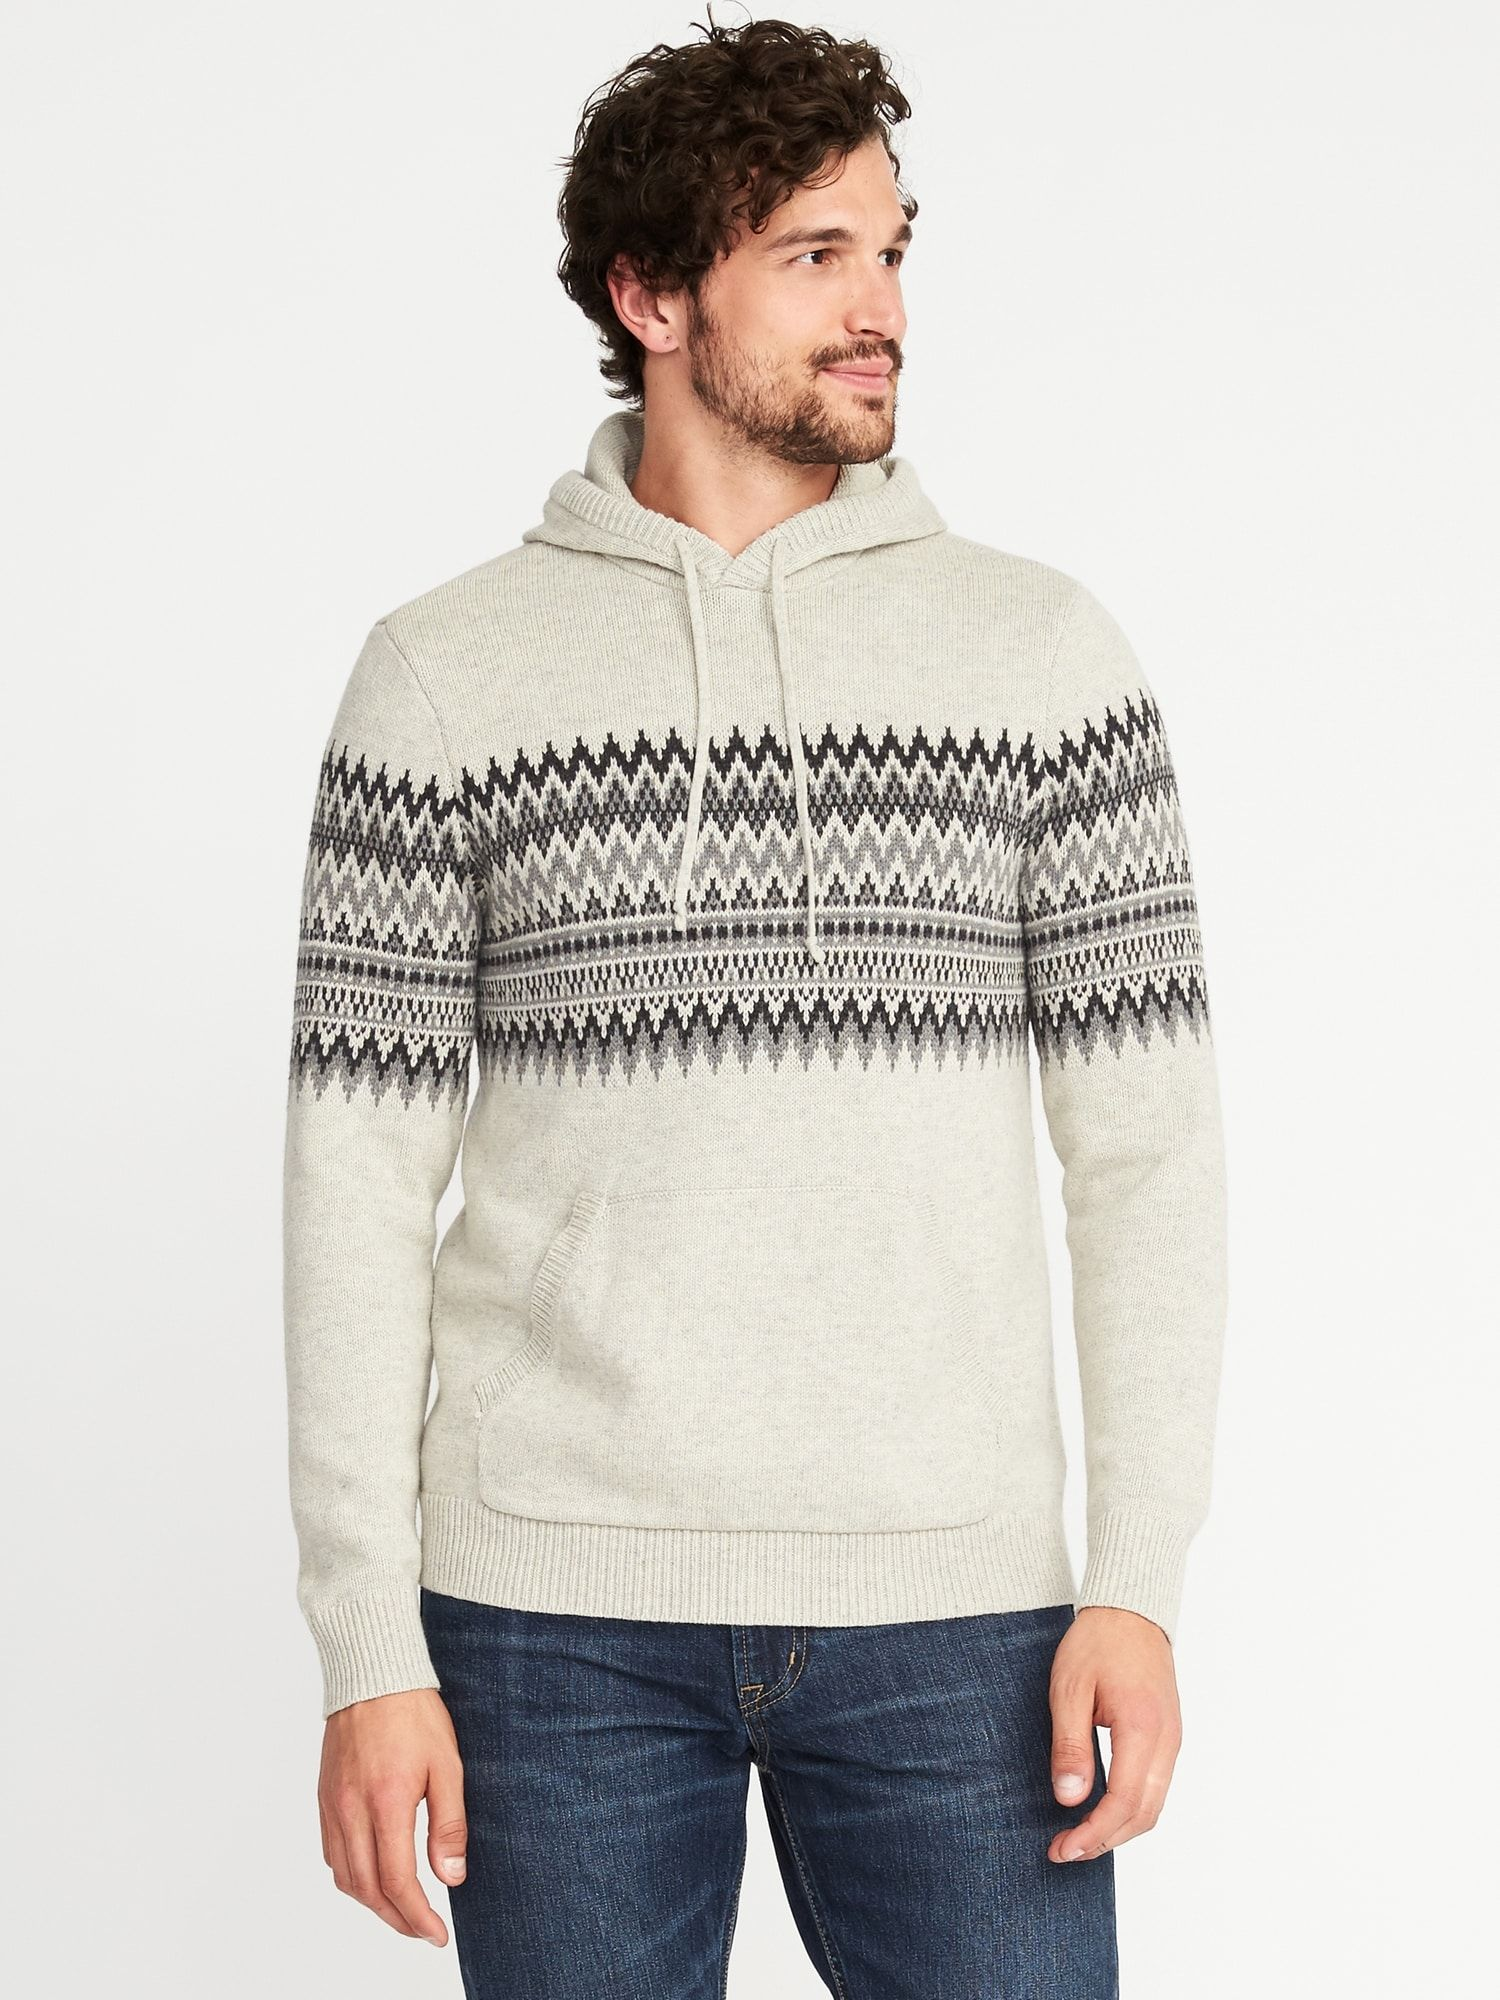 Fair Isle Sweater Hoodie for Men | Old Navy | Christmas List ...